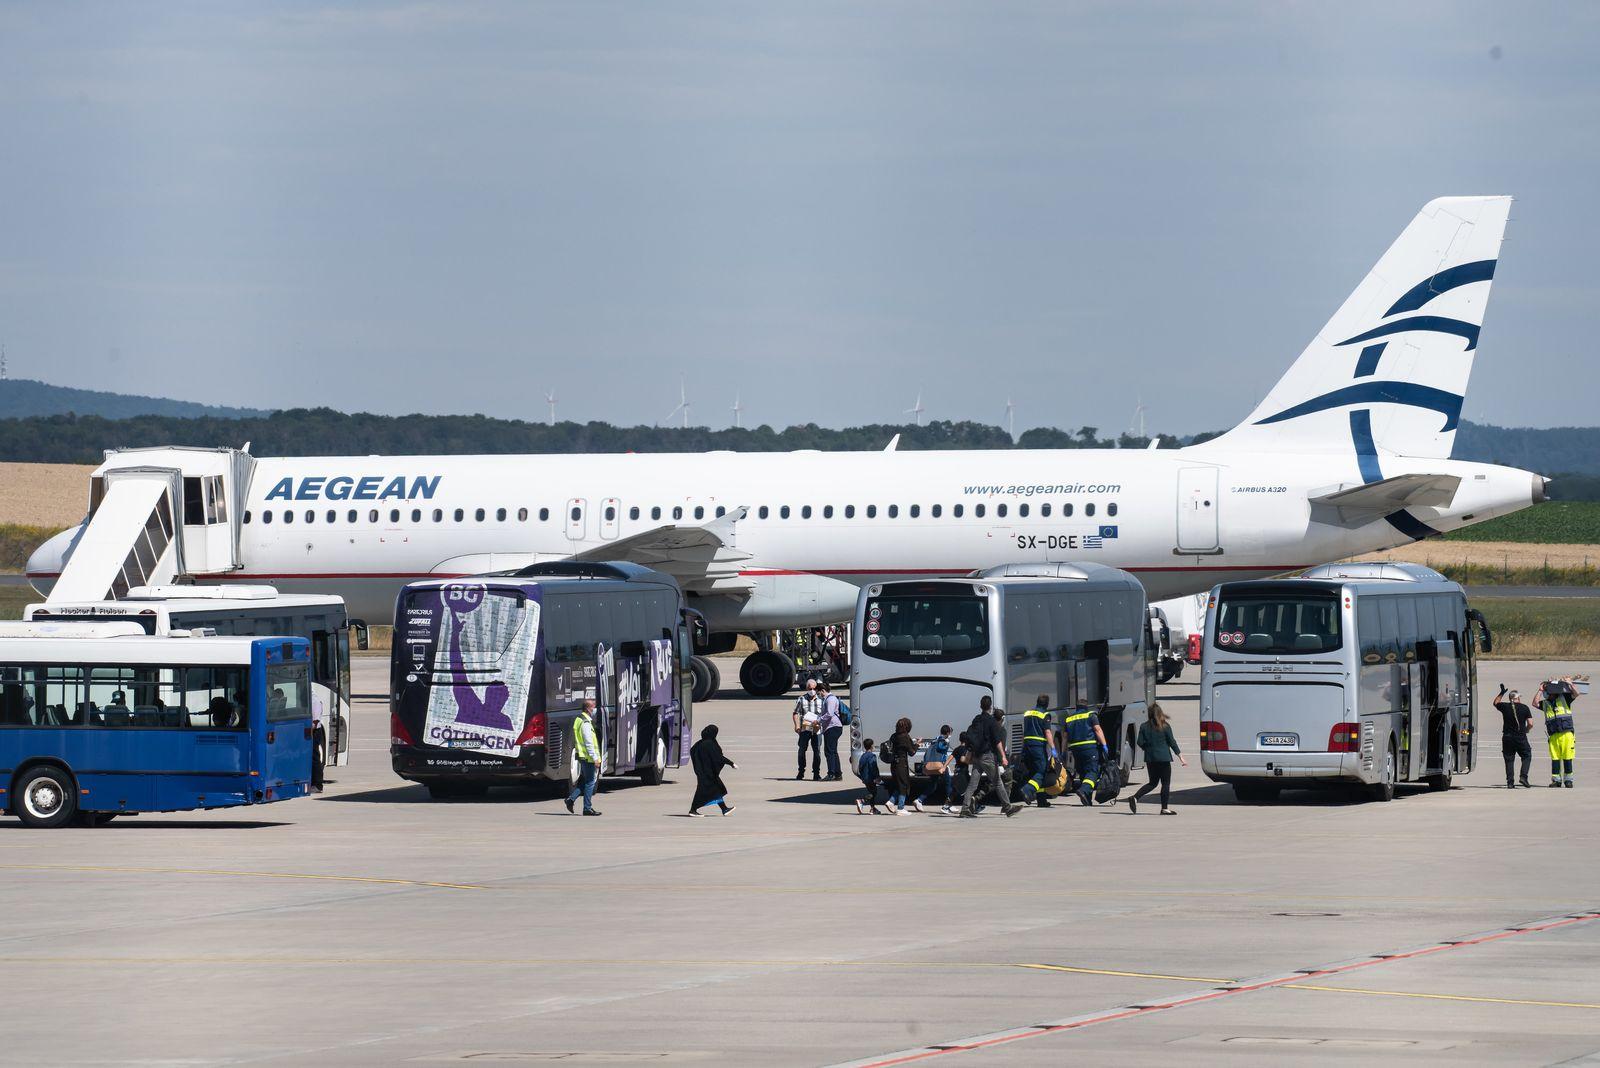 Ankunft Flüchtlinge aus griechischen Flüchtlingslagern